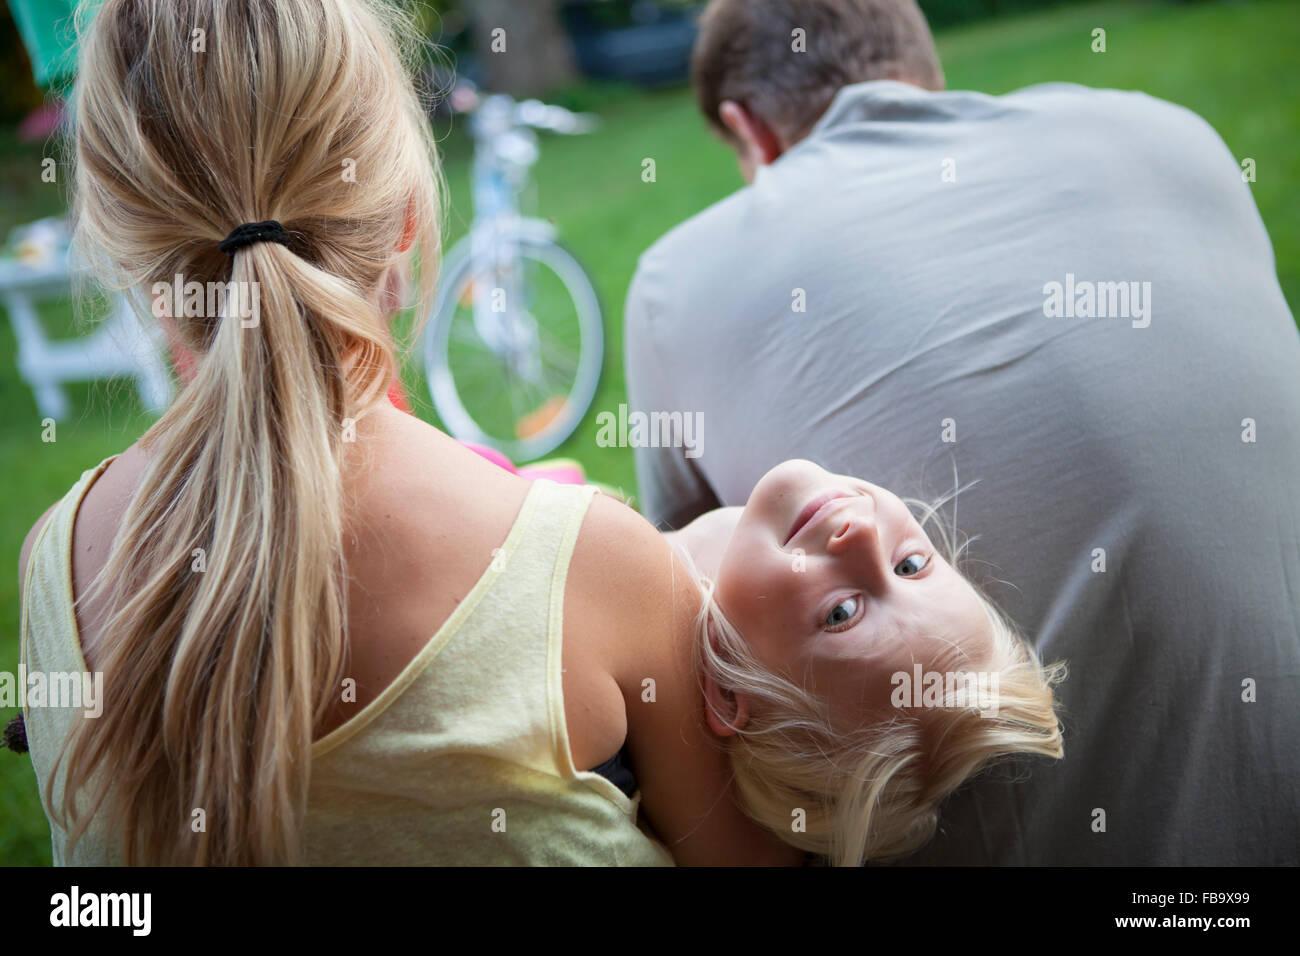 Sweden, Narke, Filipshyttan, Portrait of girls (6-7, 14-15) with father - Stock Image